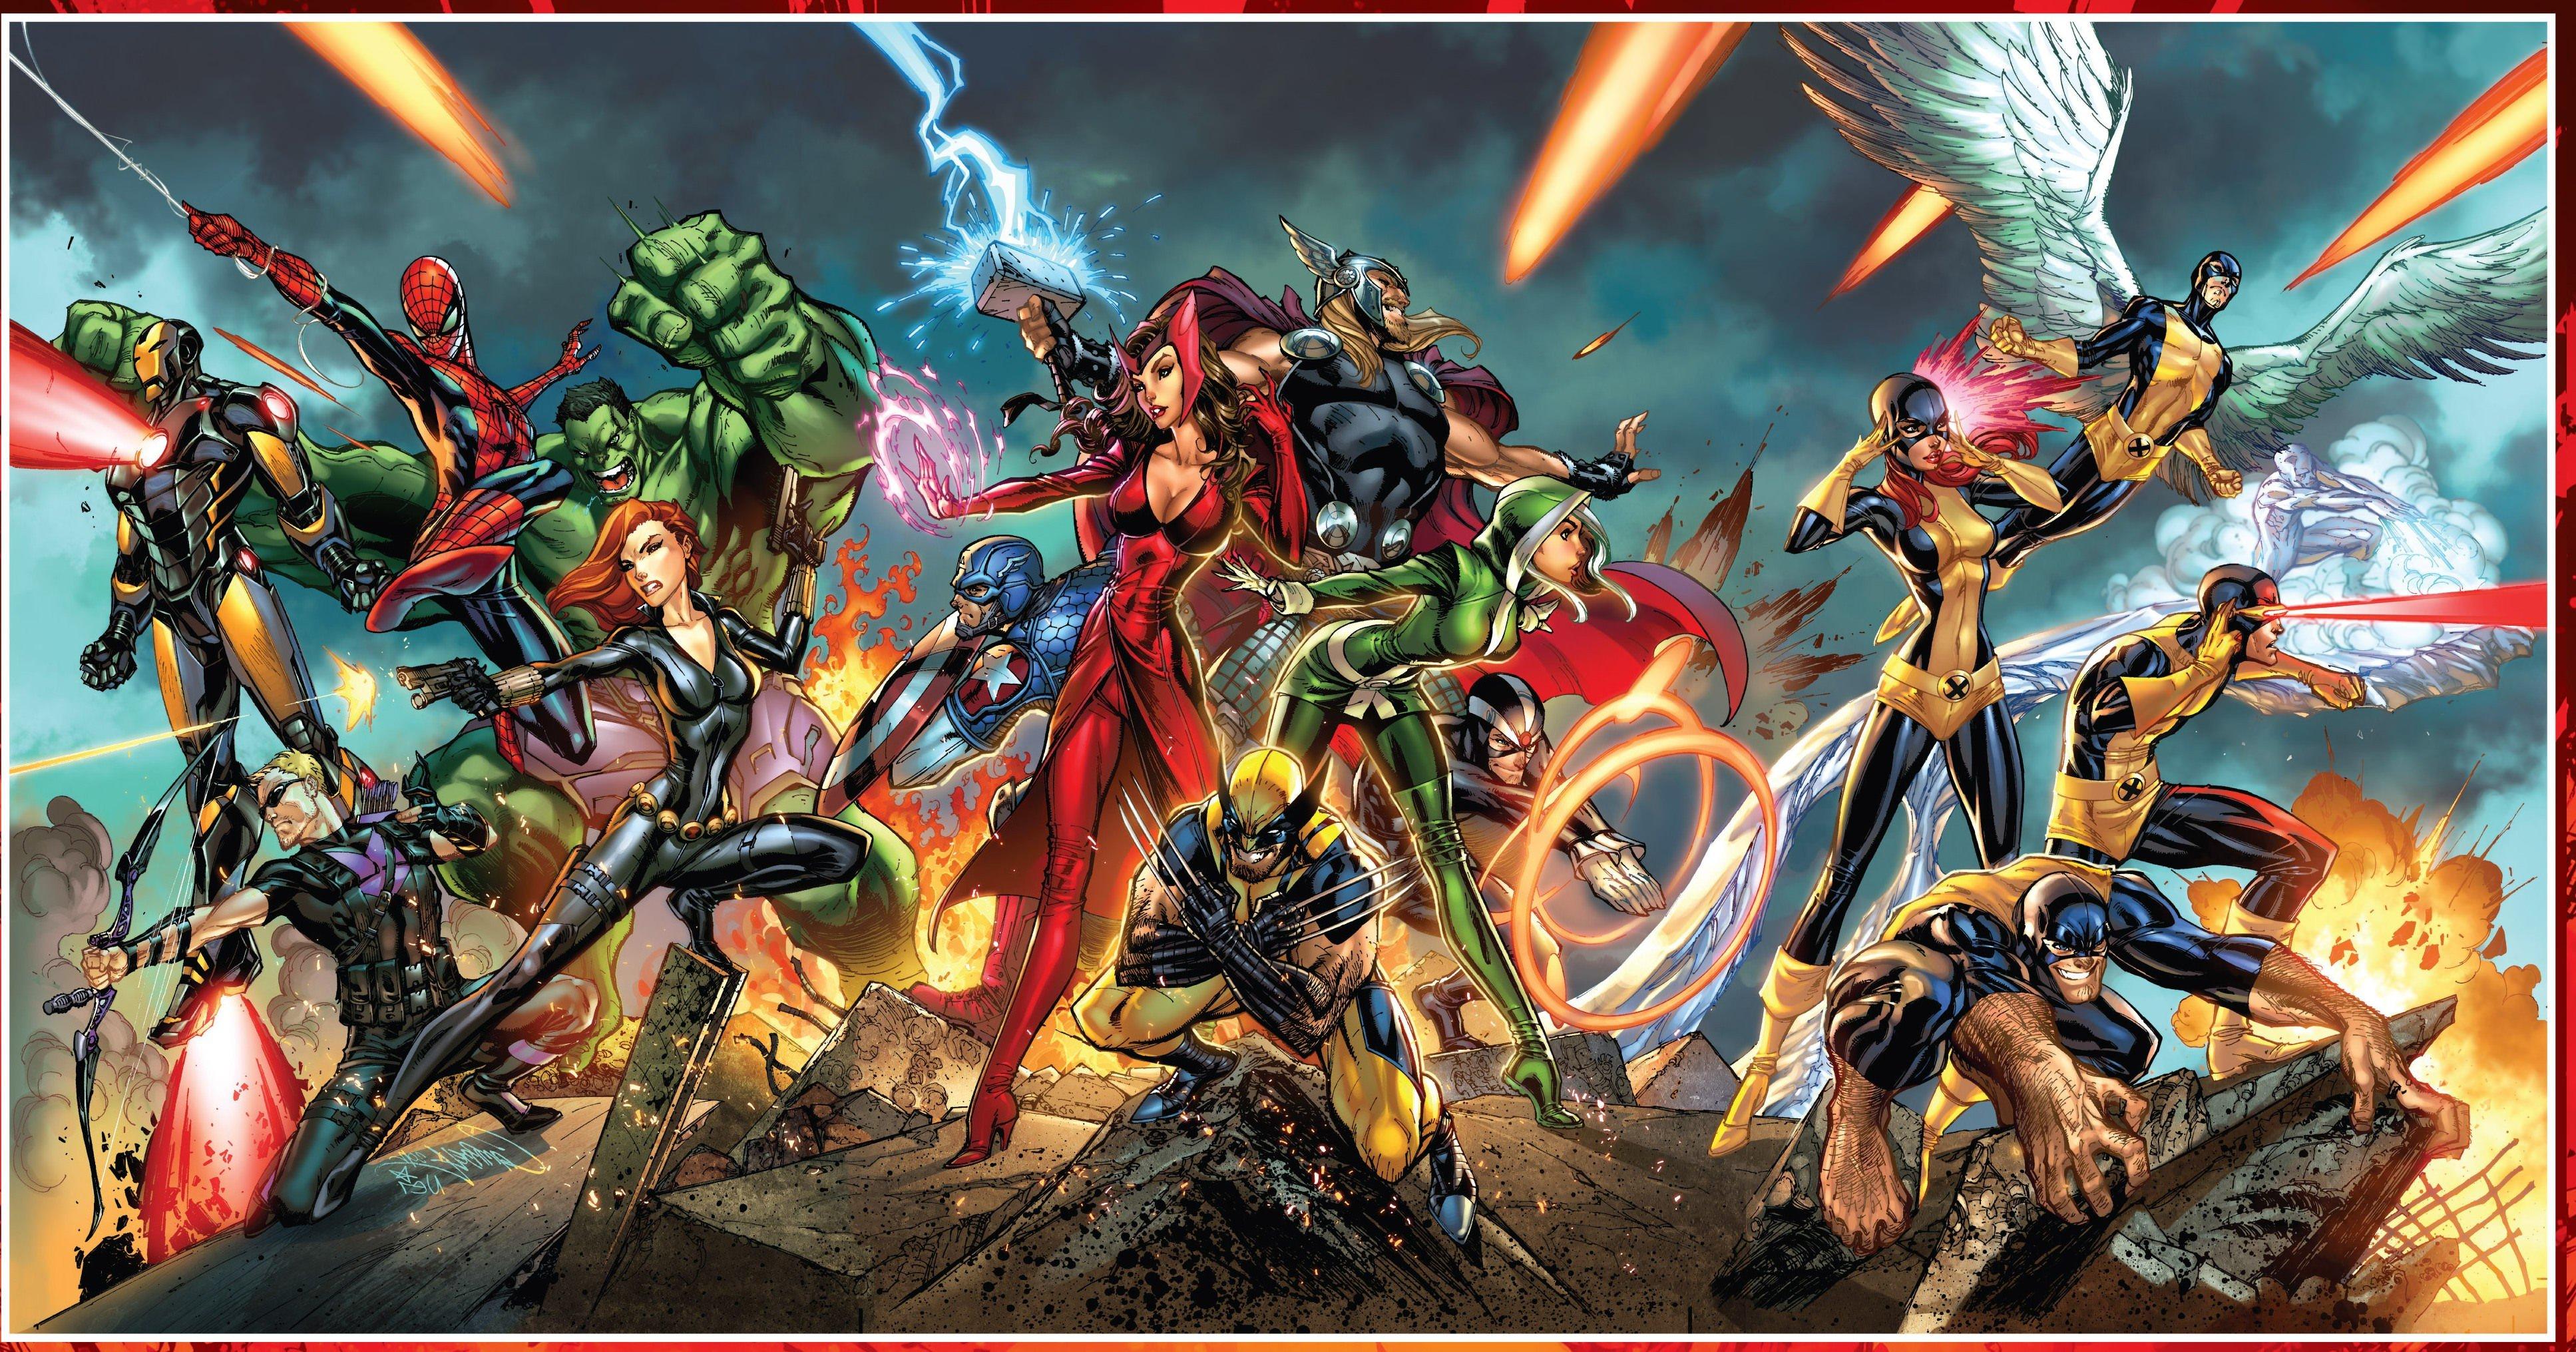 Wallpaper 3870x2031 Px Action Adventure Comics Fantasy Fi